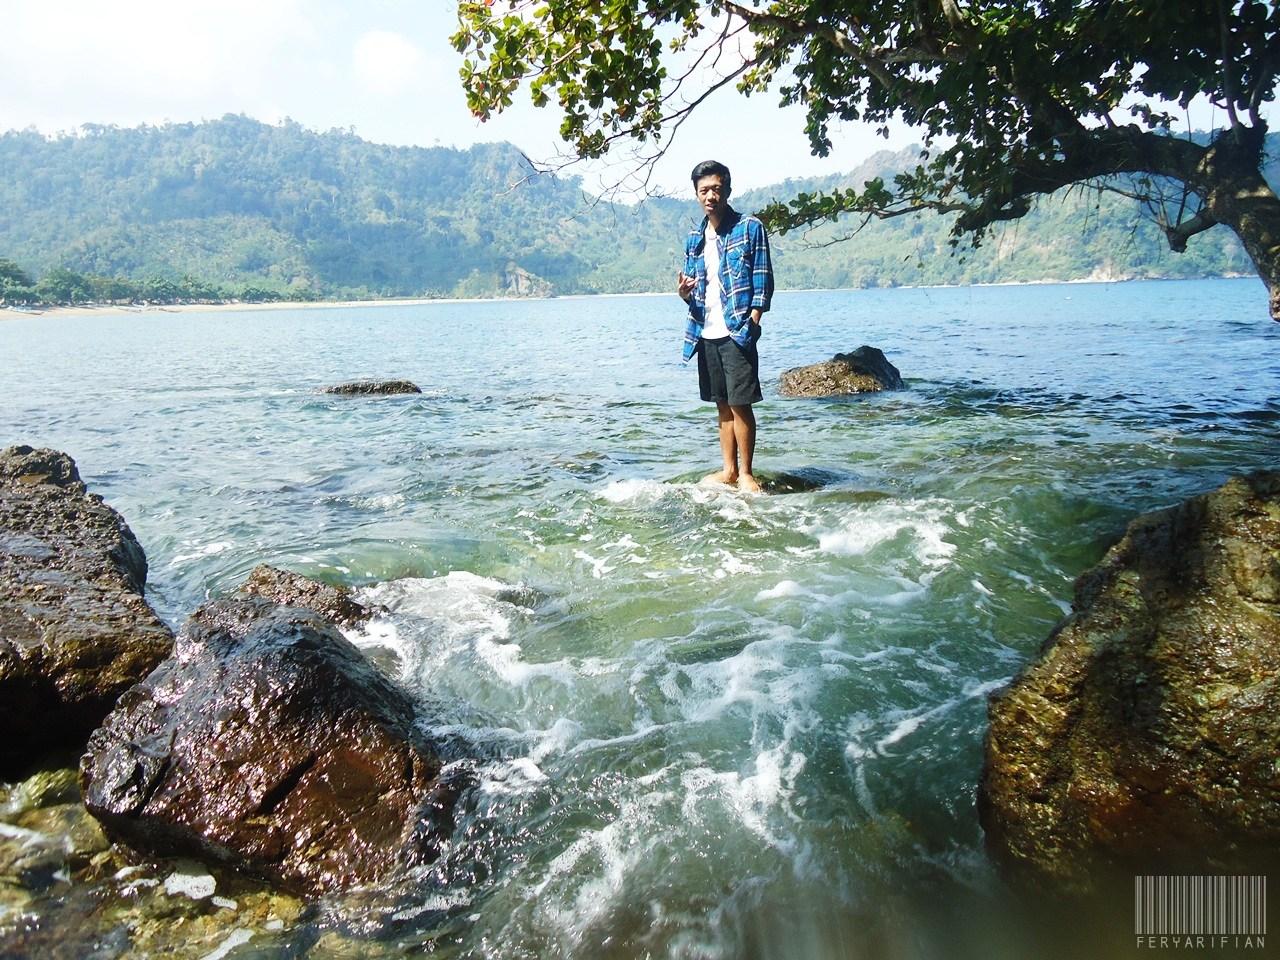 Menguak Keperawanan Pantai Sipelot Salah Satu Surga Malang Http 1